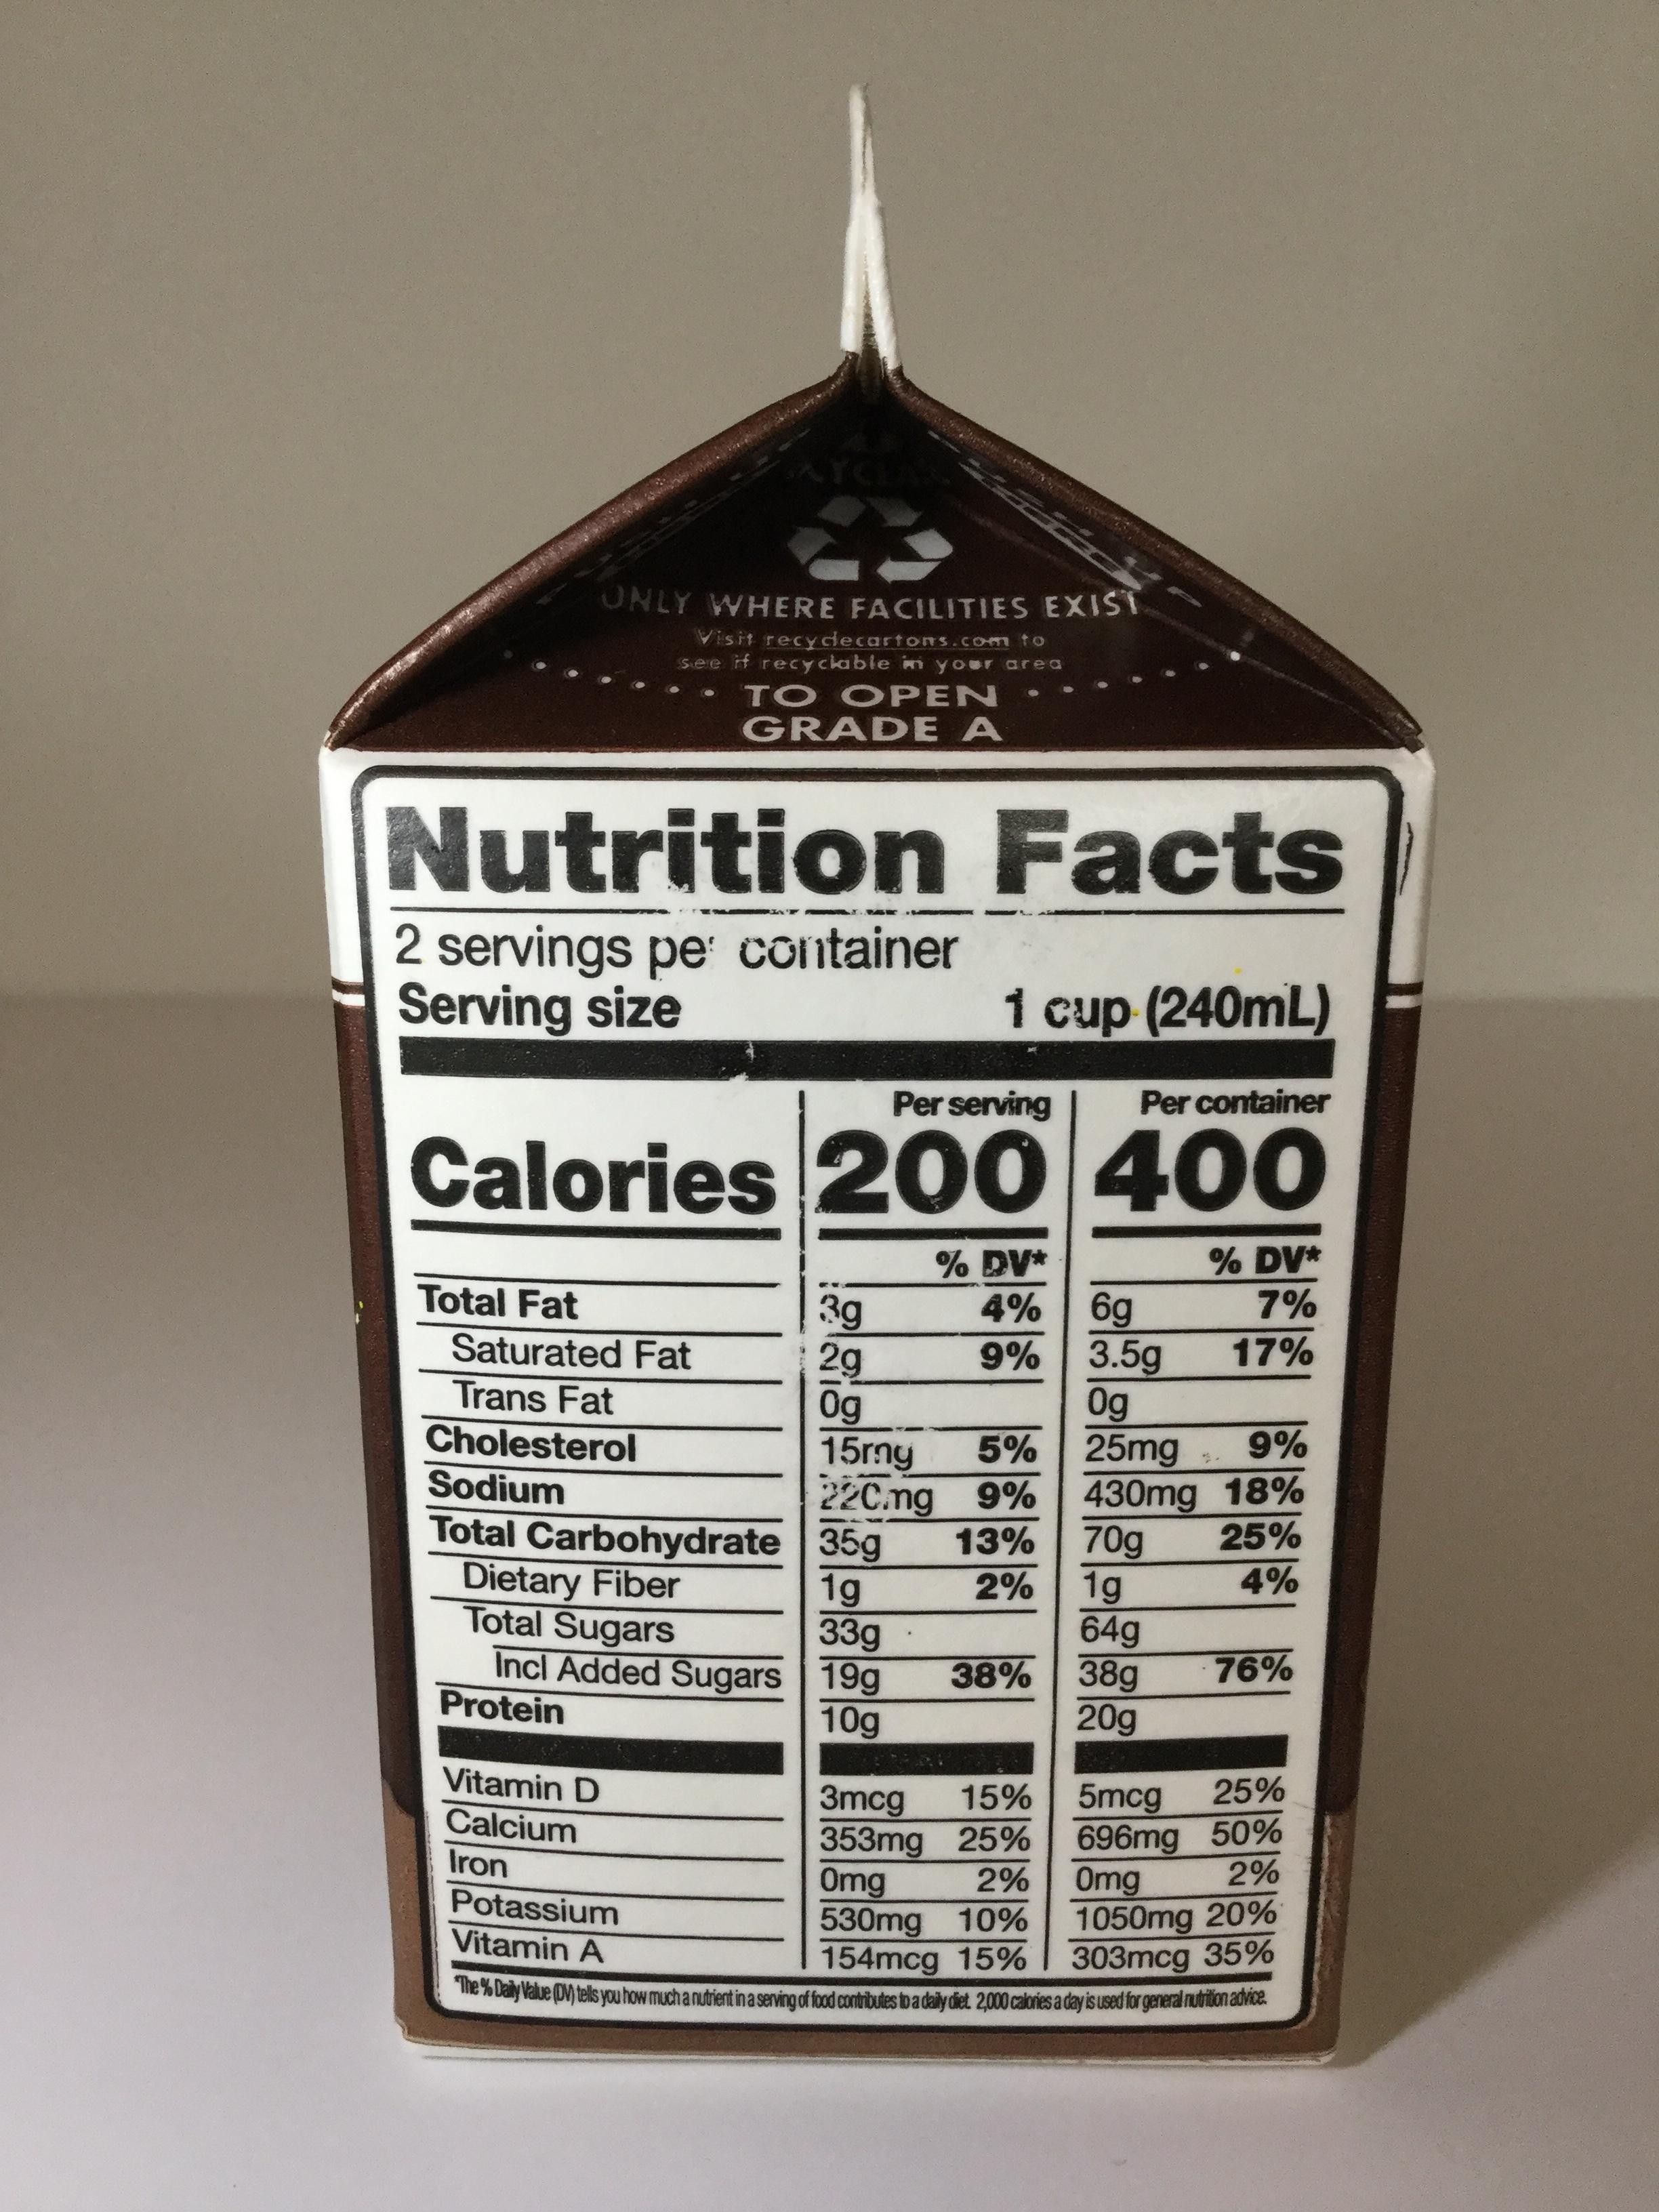 Breckenridge Farms Lowfat Chocolate Milk Side 1